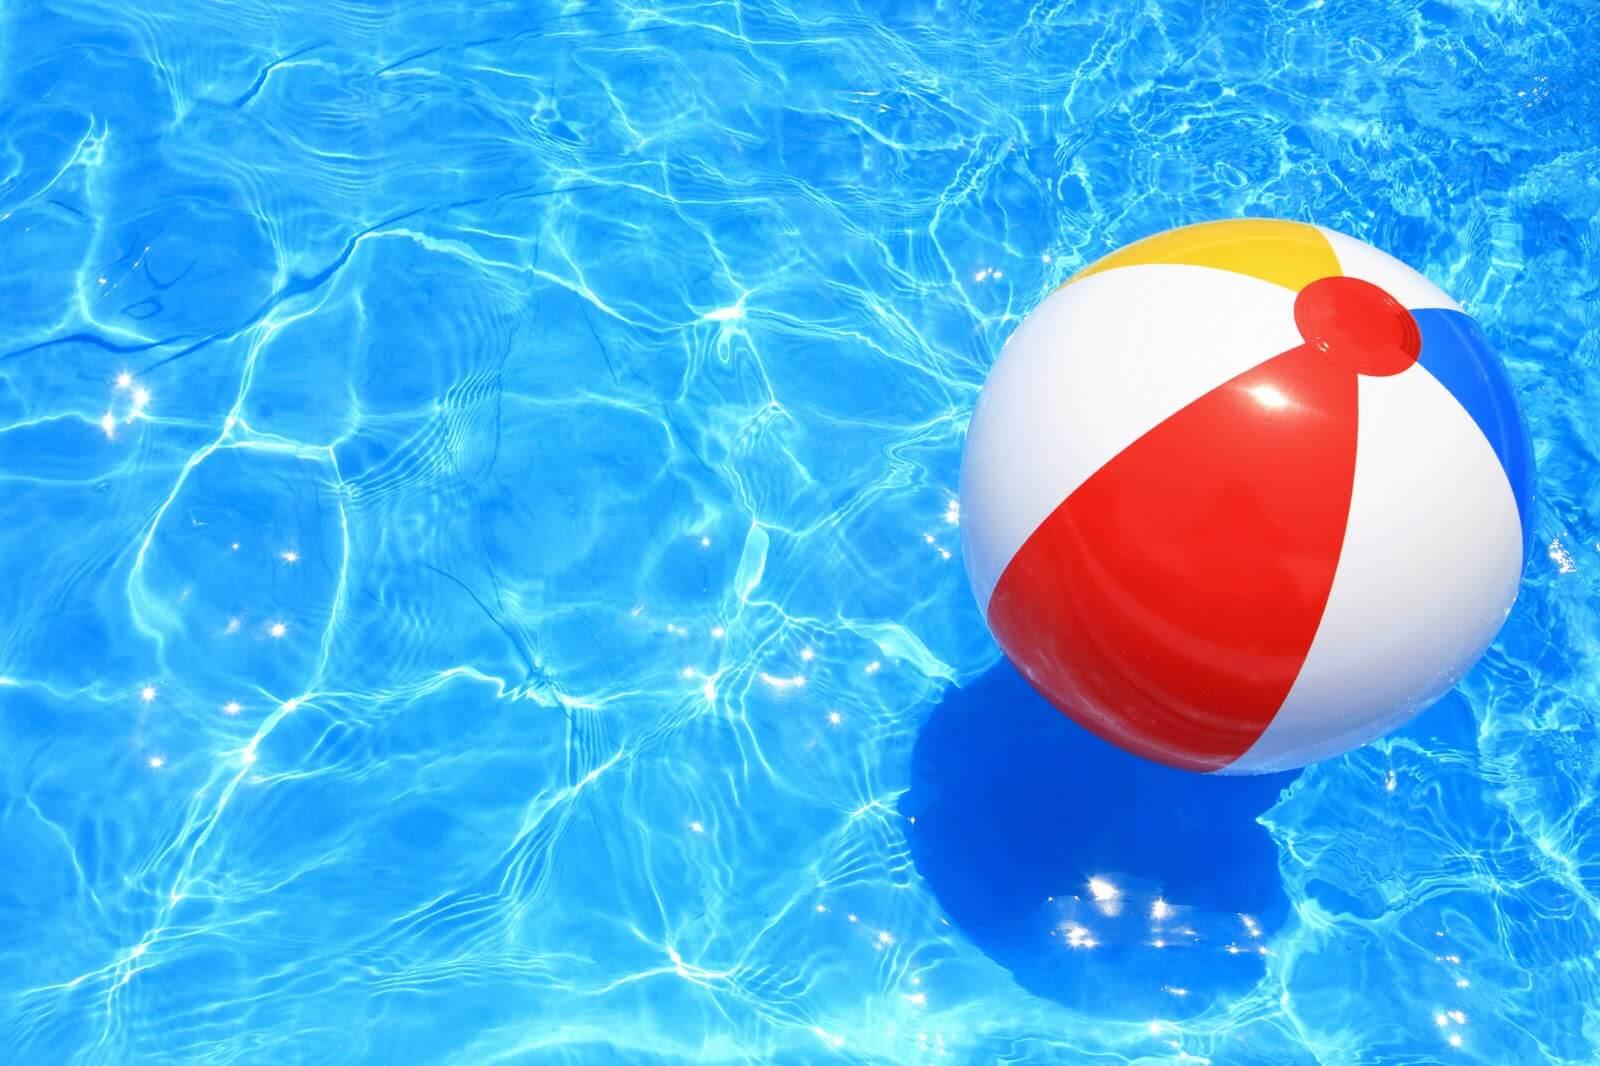 Beach ball in a pool -Magoosh